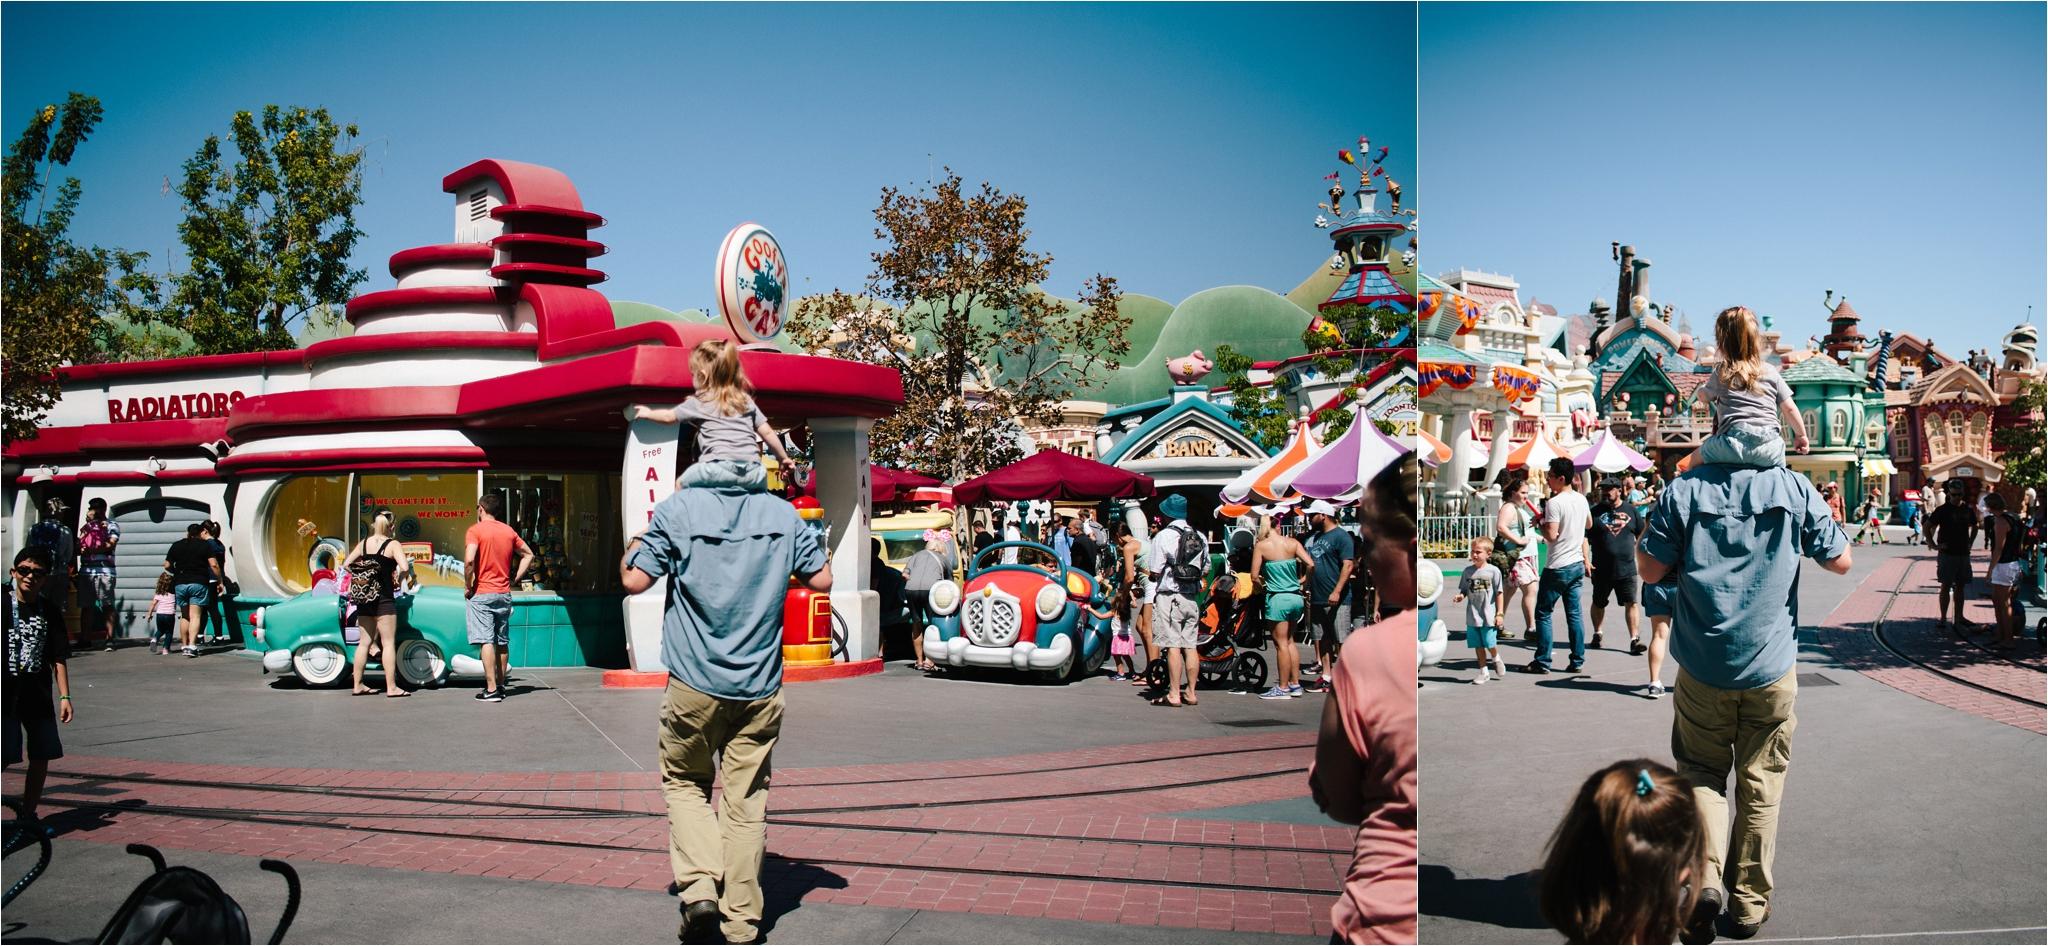 Disneylandroundtwopersonalimages_0017.jpg